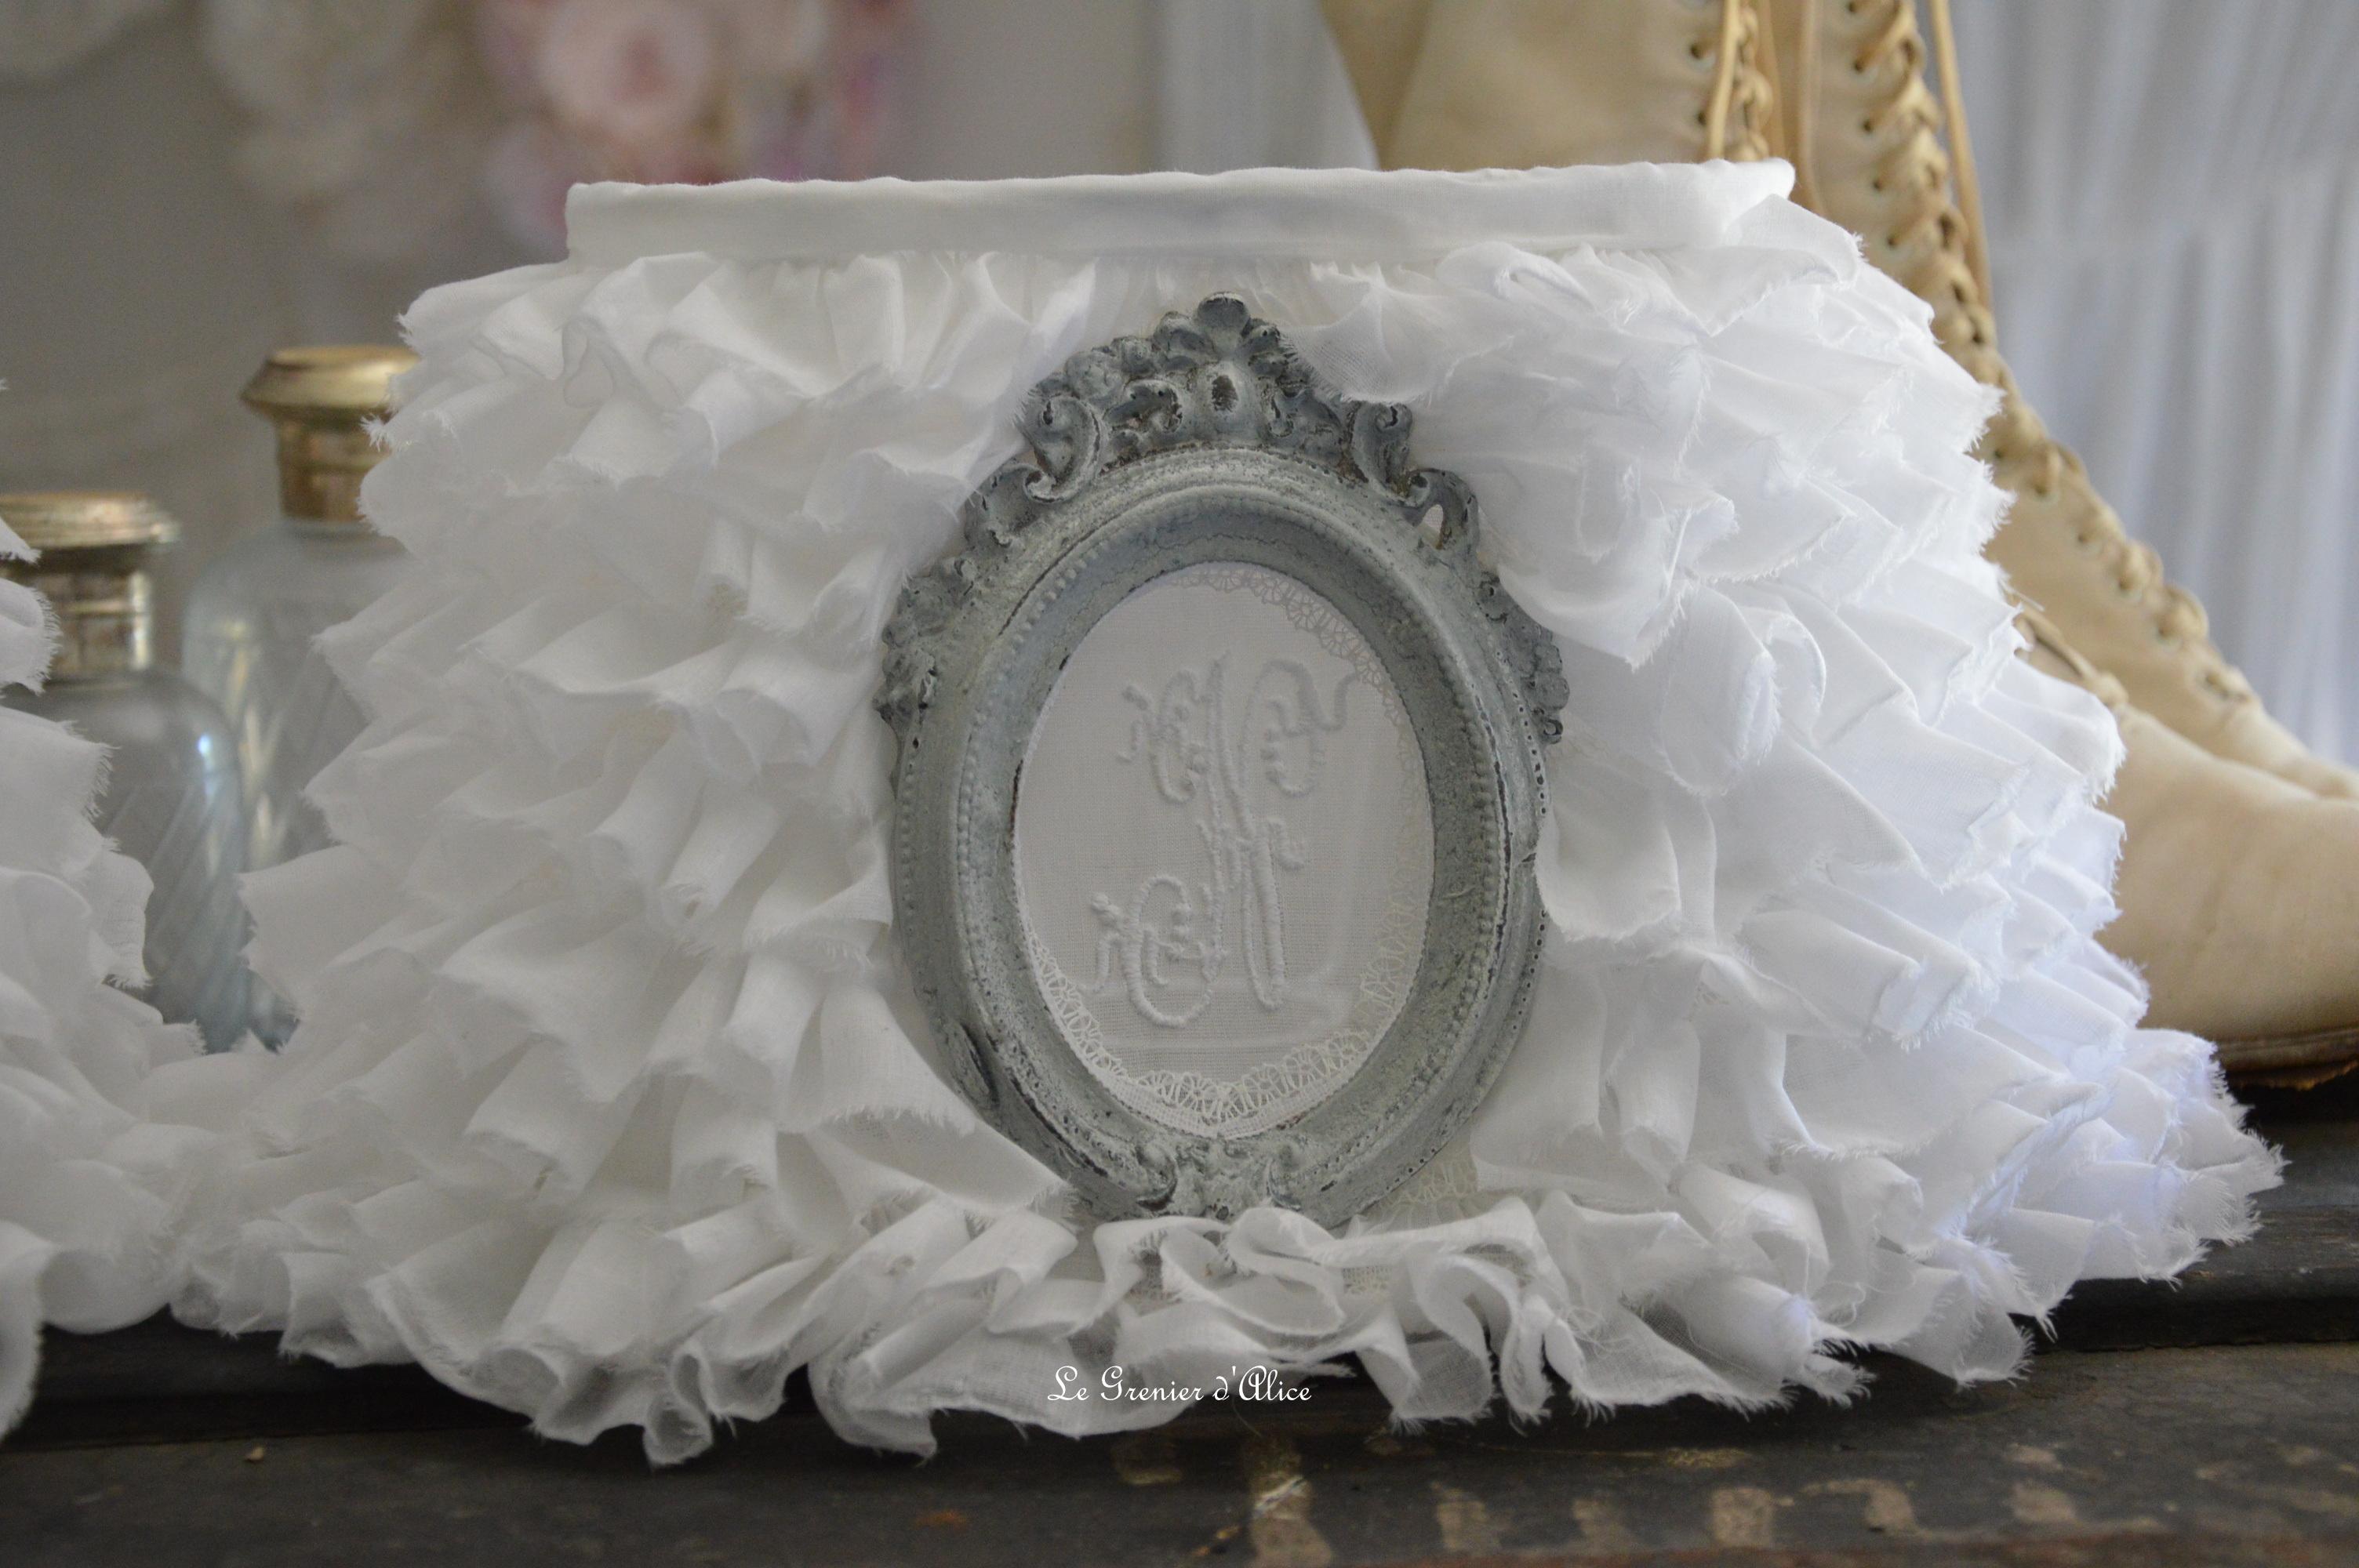 Abat jour oval froufrou organdi blanc shabby chic et romantique monogramme ornement patiné gris gustavien Shabby ruffle lampshade 2